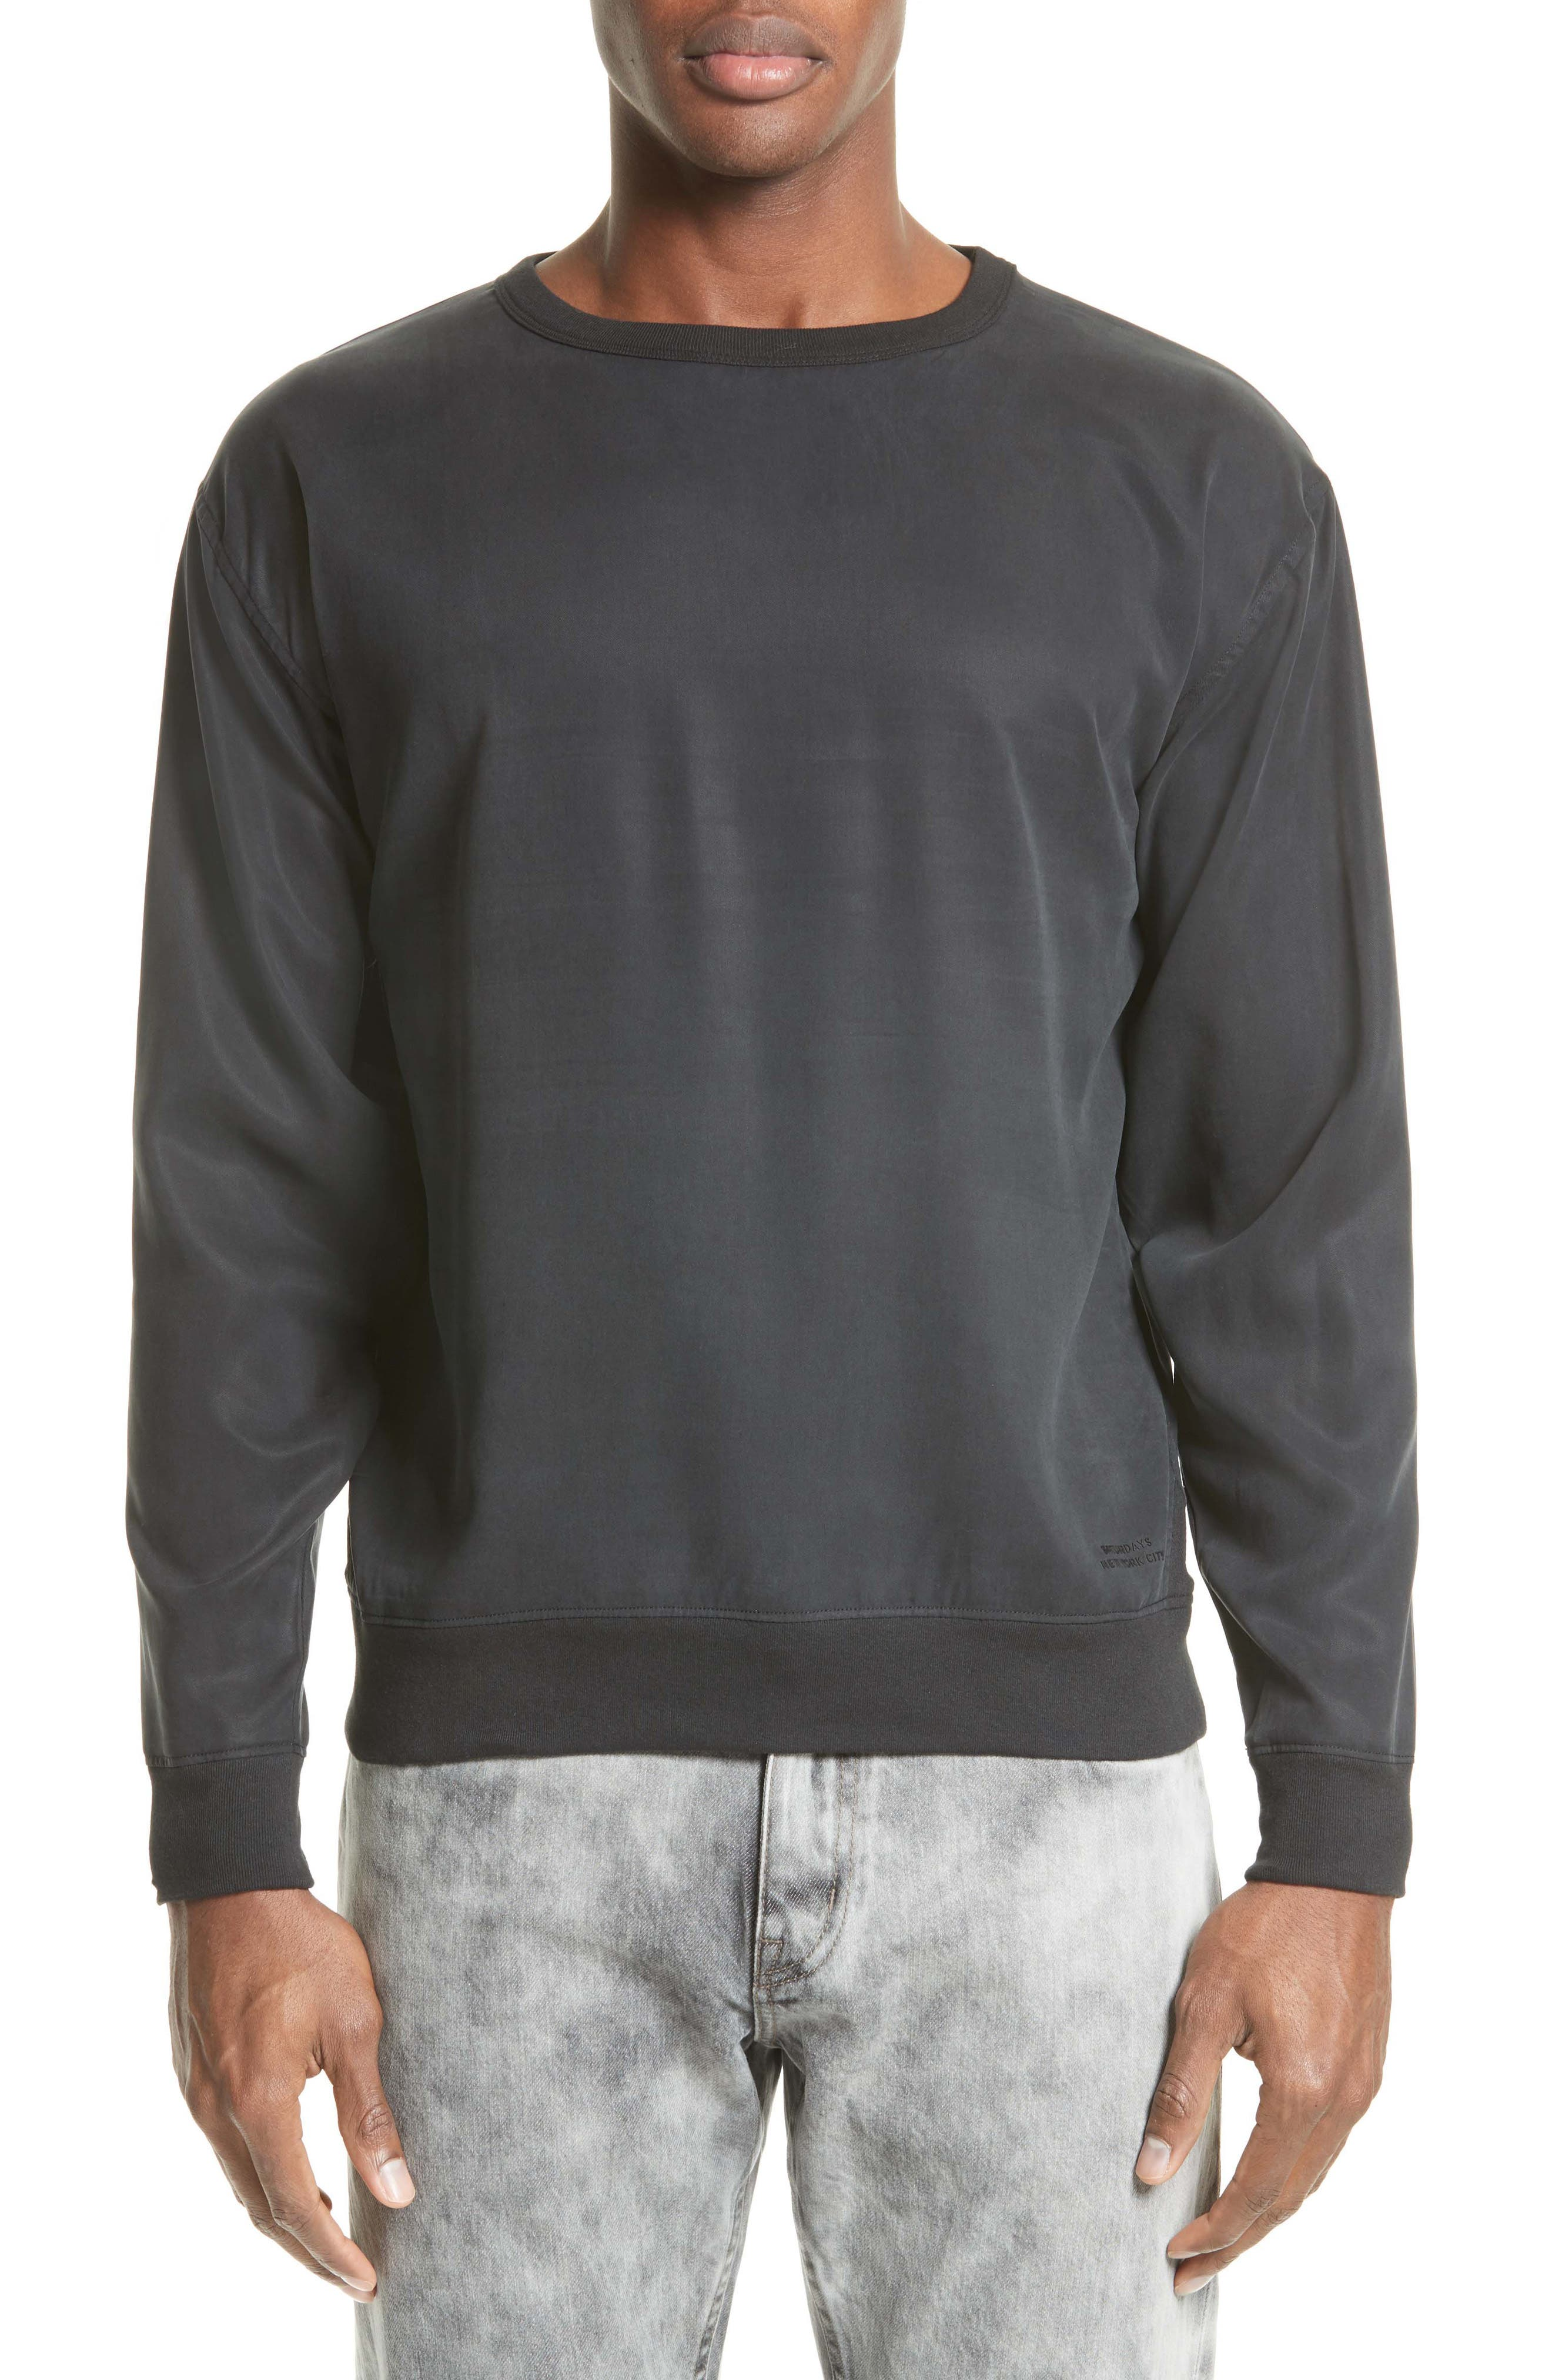 Duey Twill Crewneck Sweatshirt,                             Main thumbnail 1, color,                             001